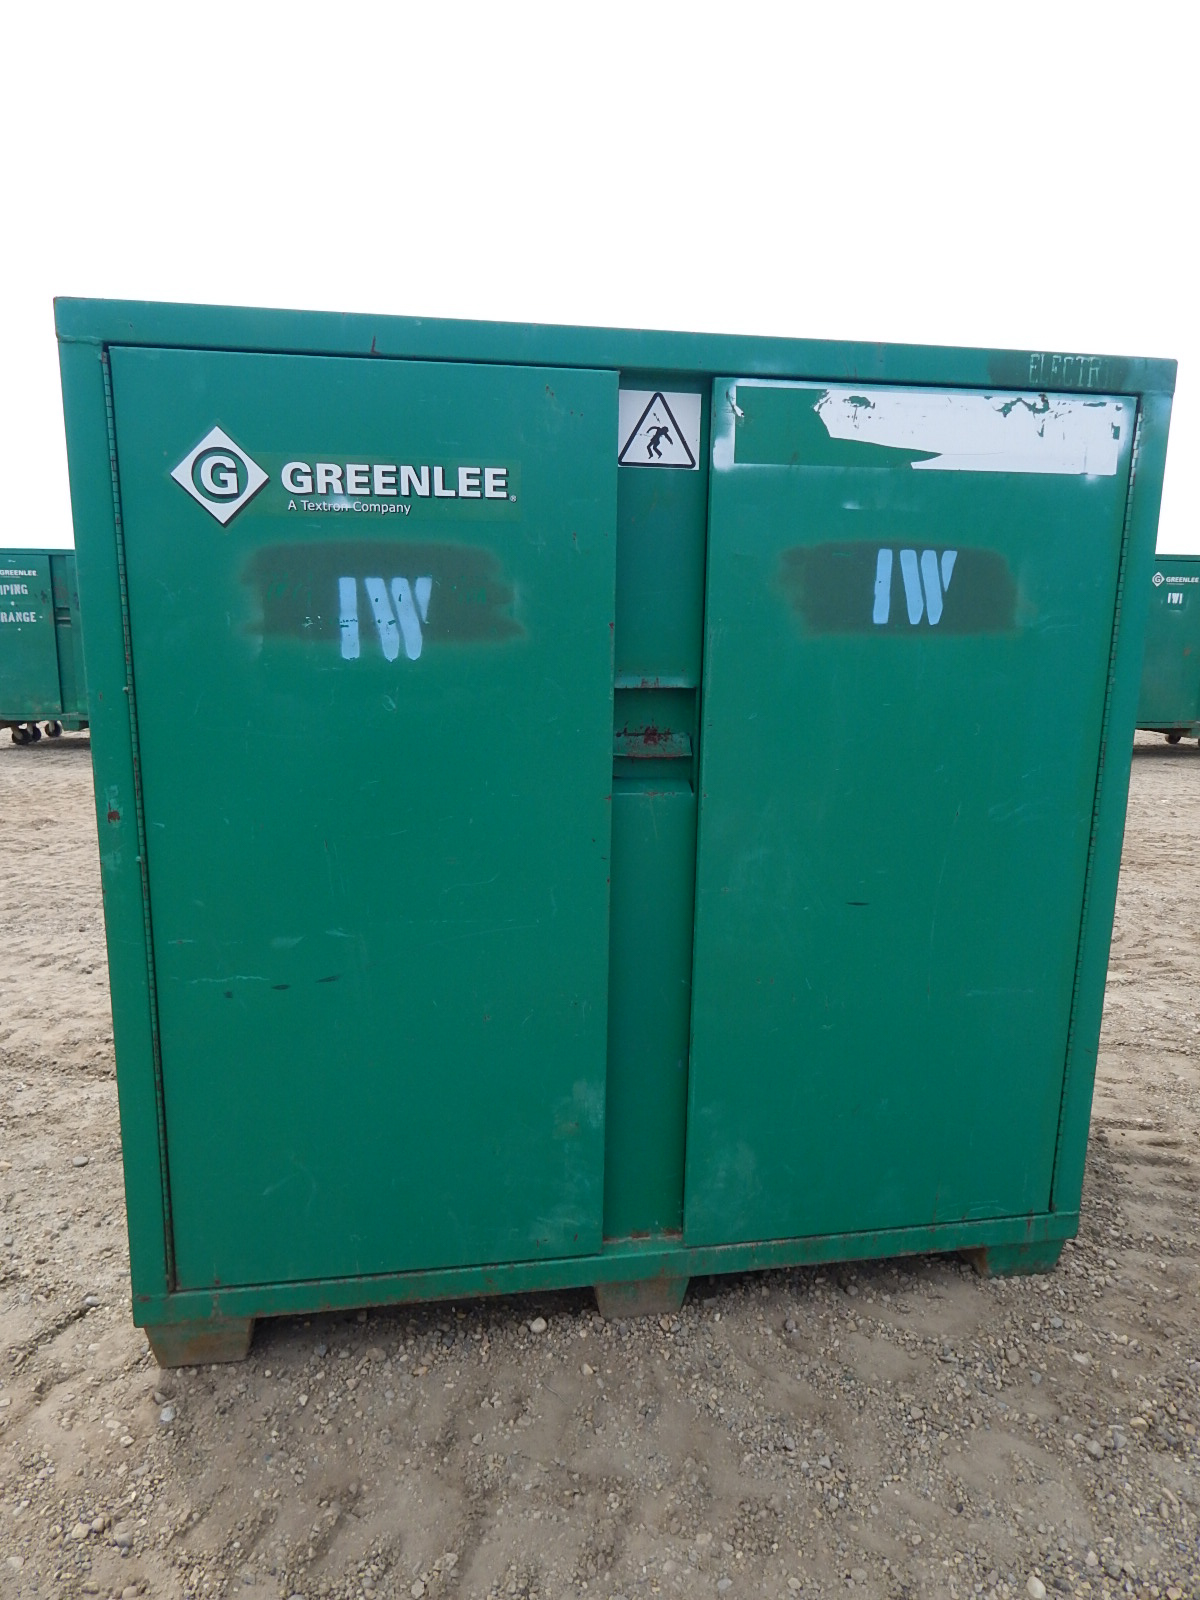 LOT/ (2) GREENLEE 2-DOOR JOB BOX CABINETS - Image 3 of 4